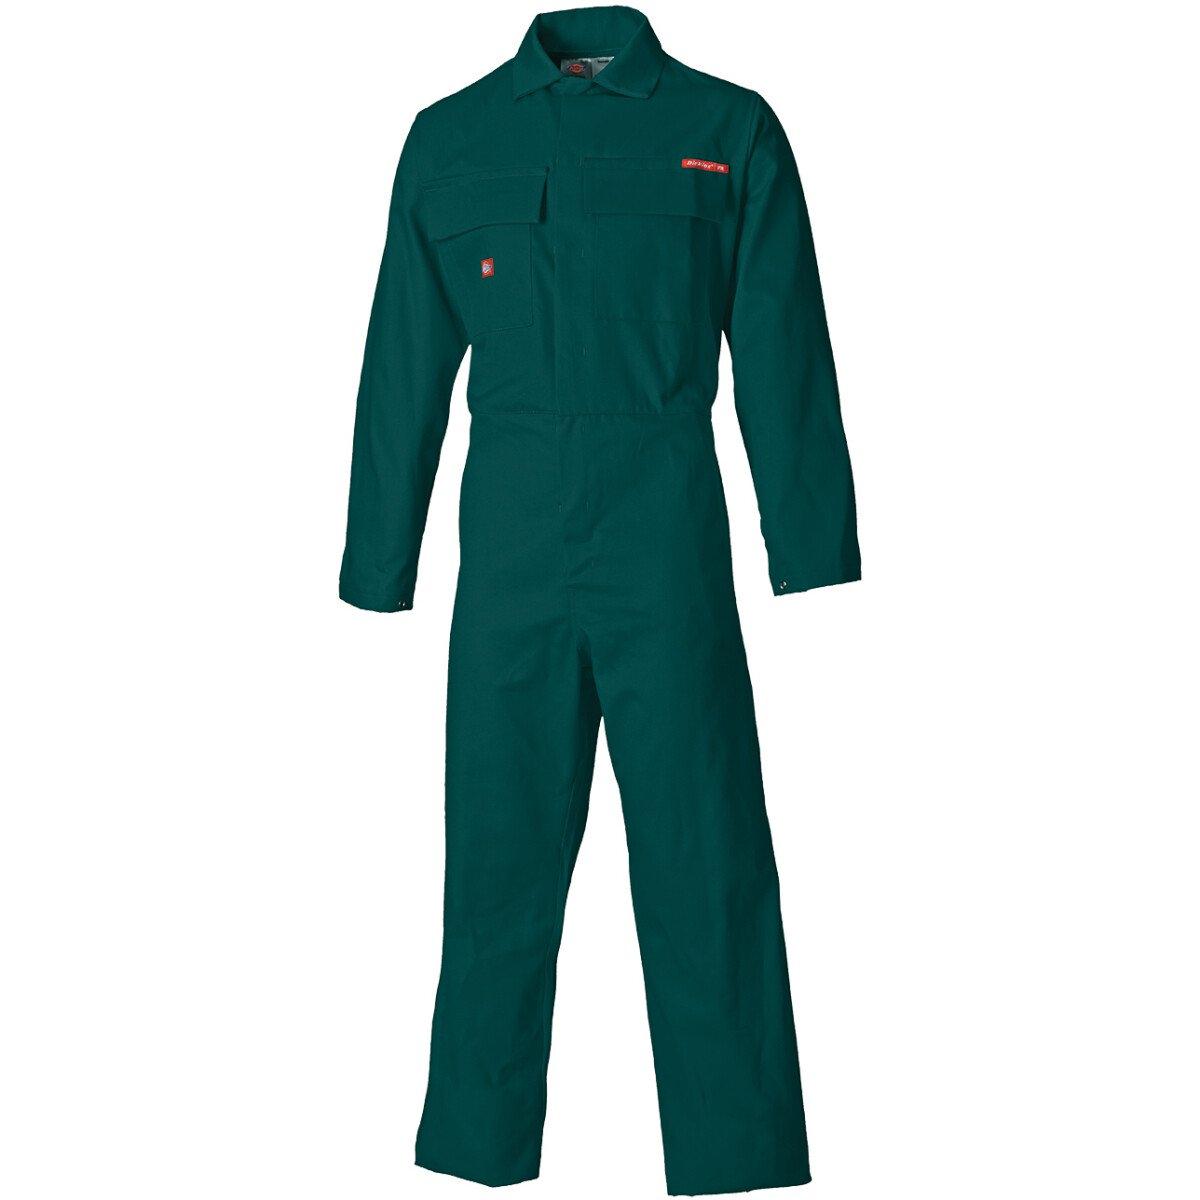 "Dickies FR4869 Proban Boilersuit Coverall FR4869 - (WAIST 52"", Reg Leg) - Vet Green - Clearance Item"